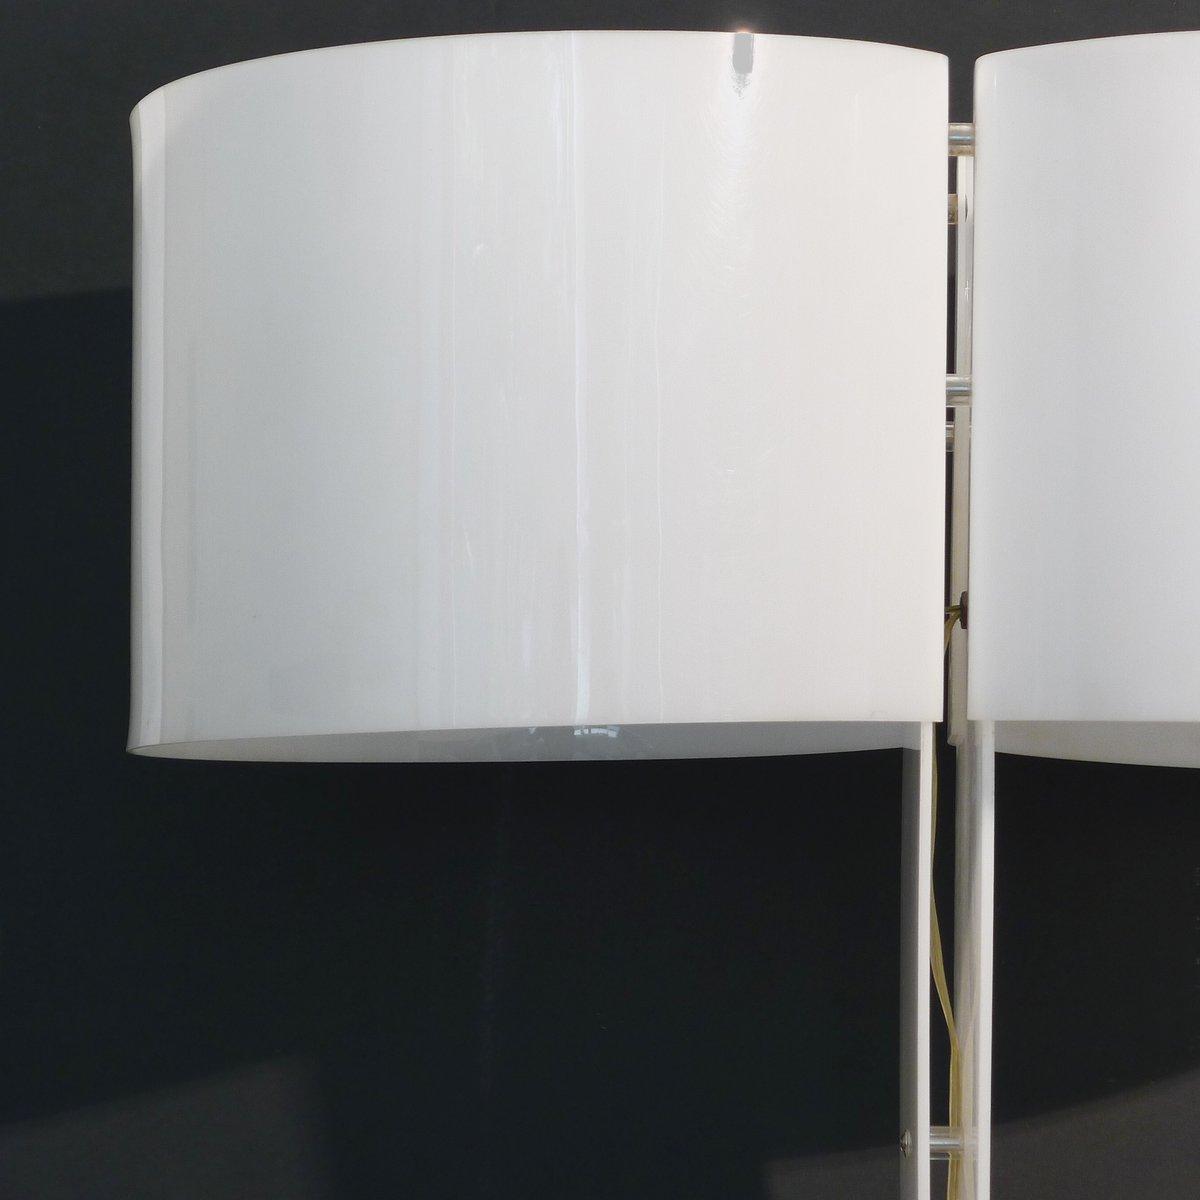 lampe de bureau vintage en plexiglas en vente sur pamono. Black Bedroom Furniture Sets. Home Design Ideas